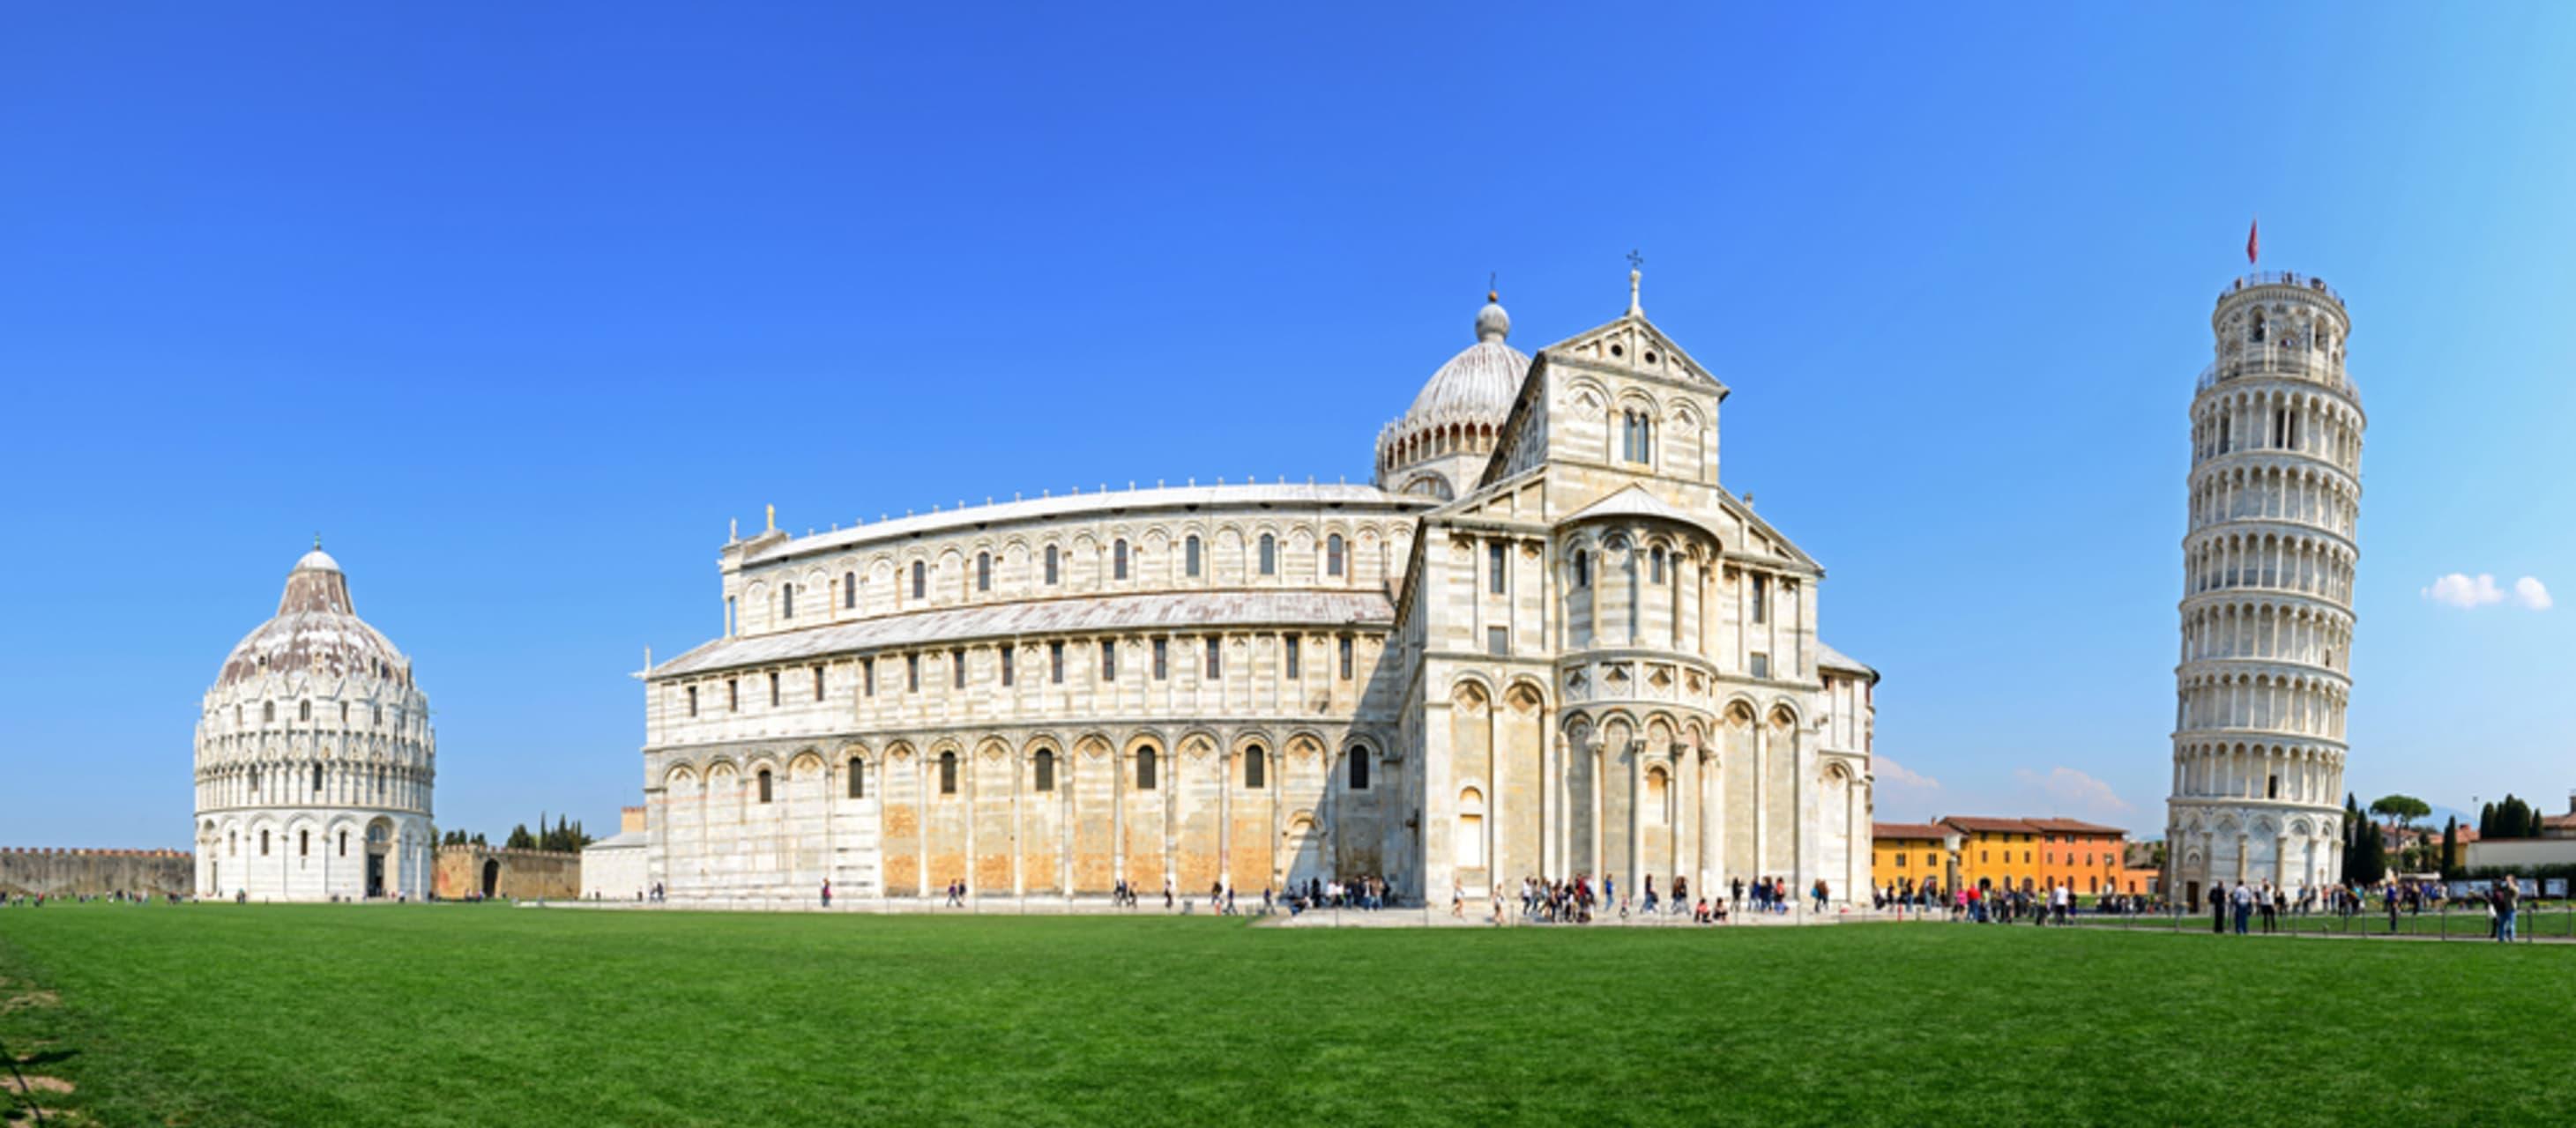 Pisa cover image